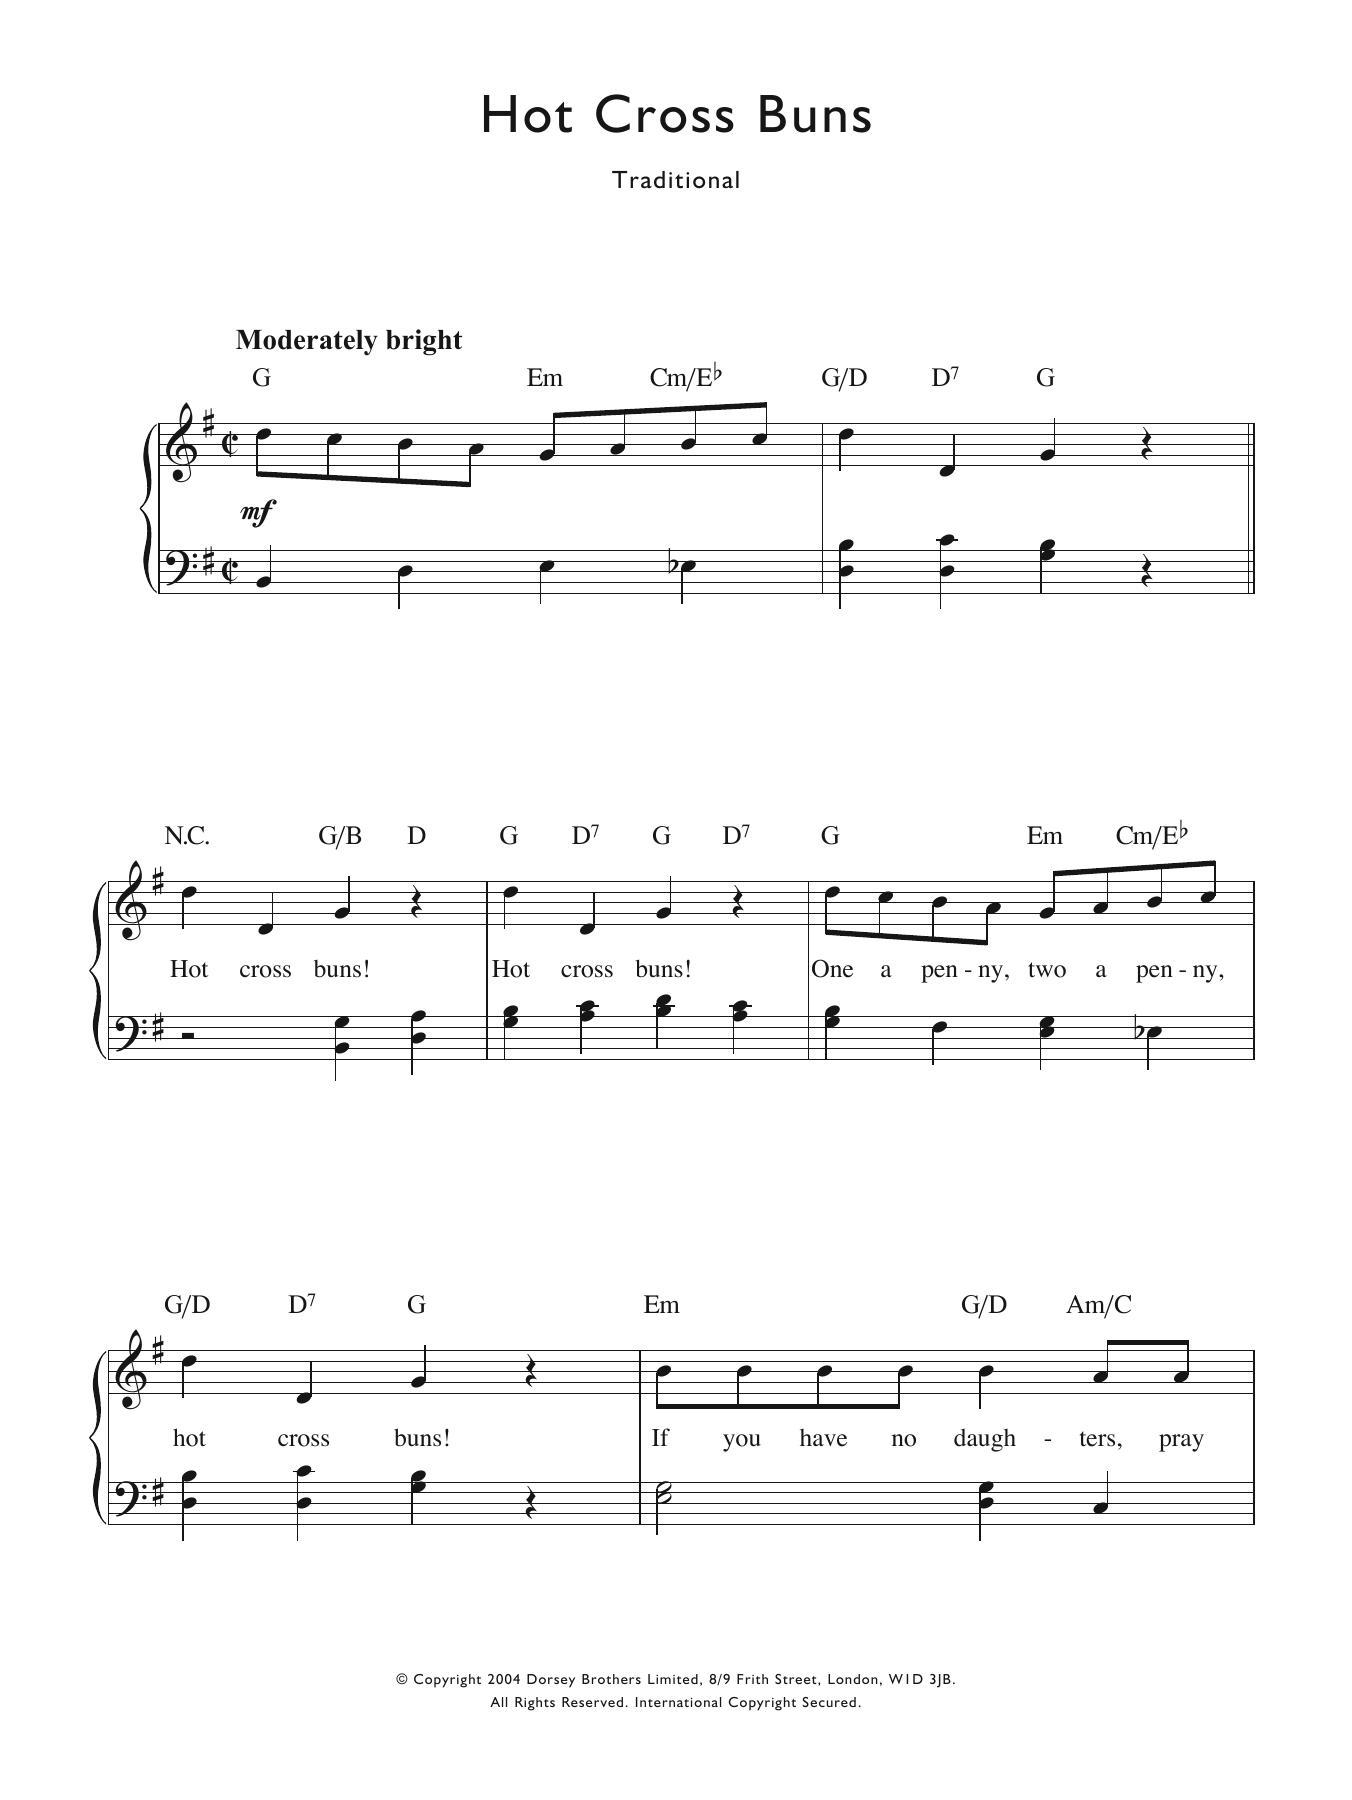 Traditional Nursery Rhyme - Hot Cross Buns